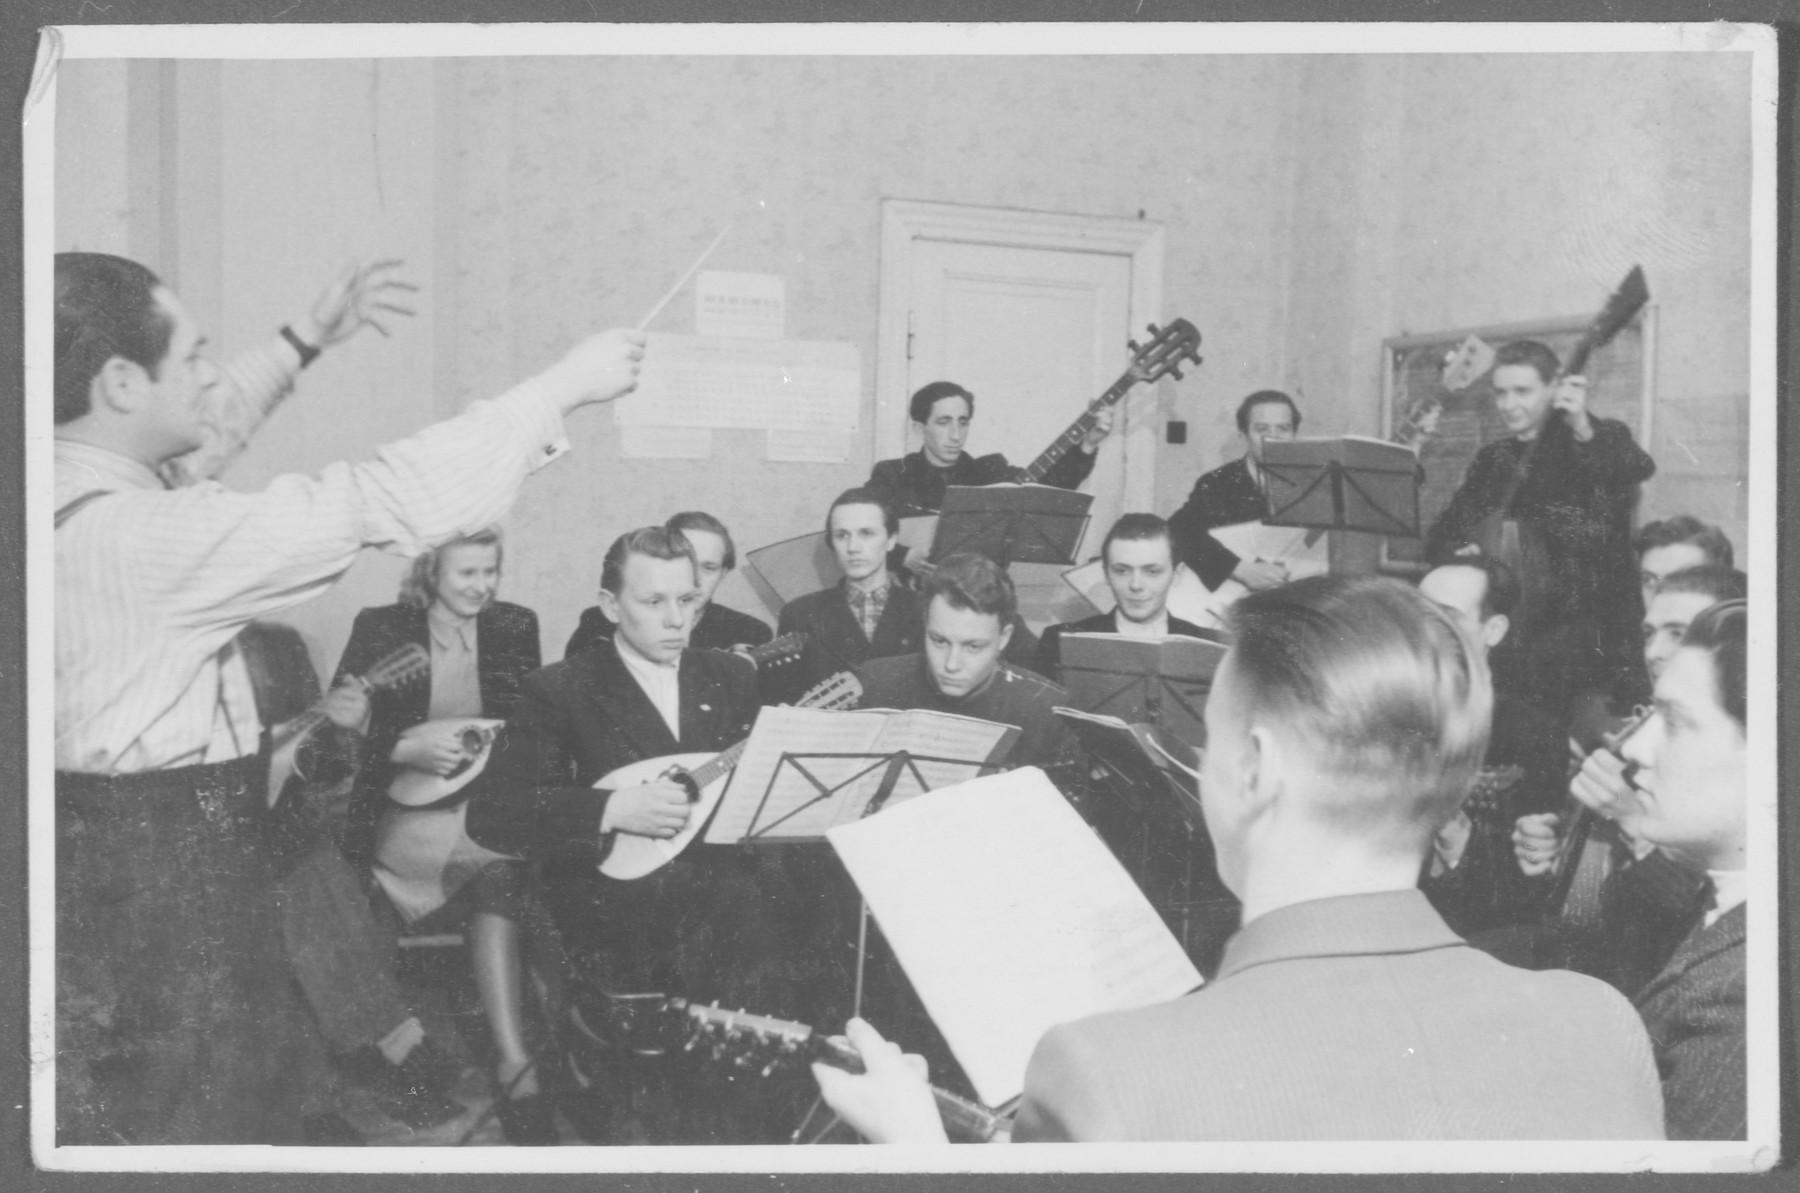 Elja Heifecs conducts a Jewish mandolin orchestra in Riga, Latvia.